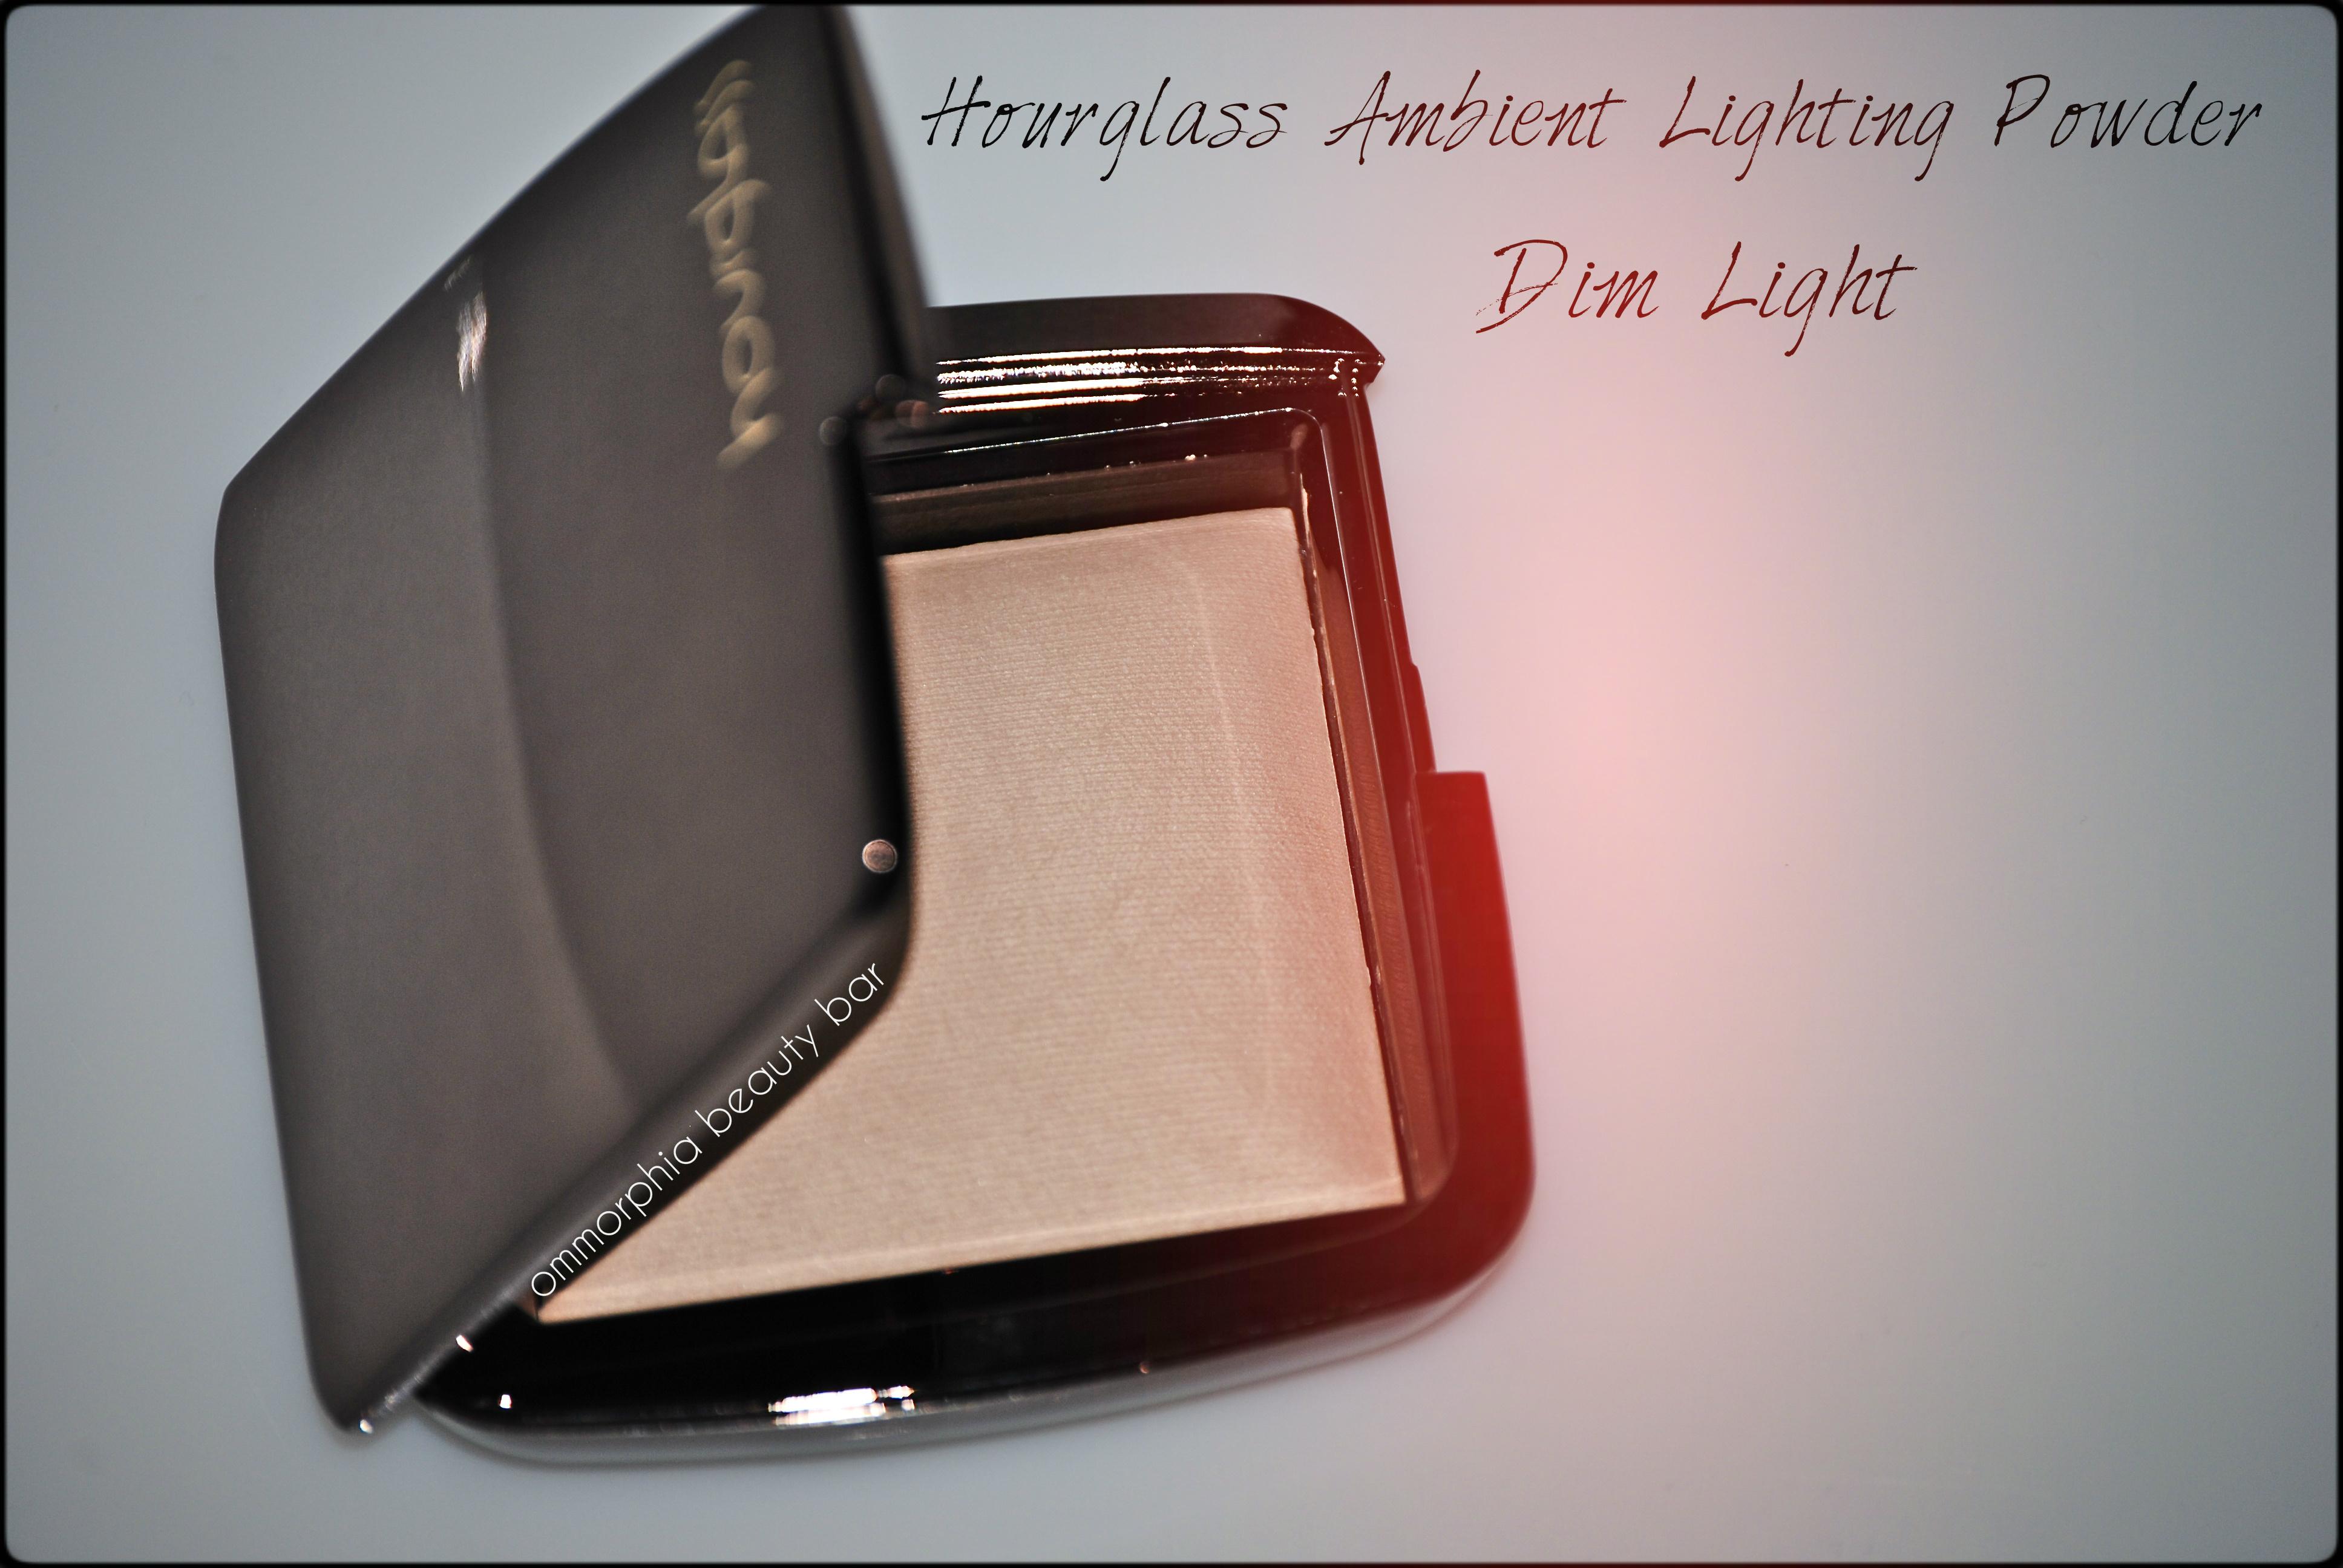 hourglass dim light ambient lighting powder. Black Bedroom Furniture Sets. Home Design Ideas